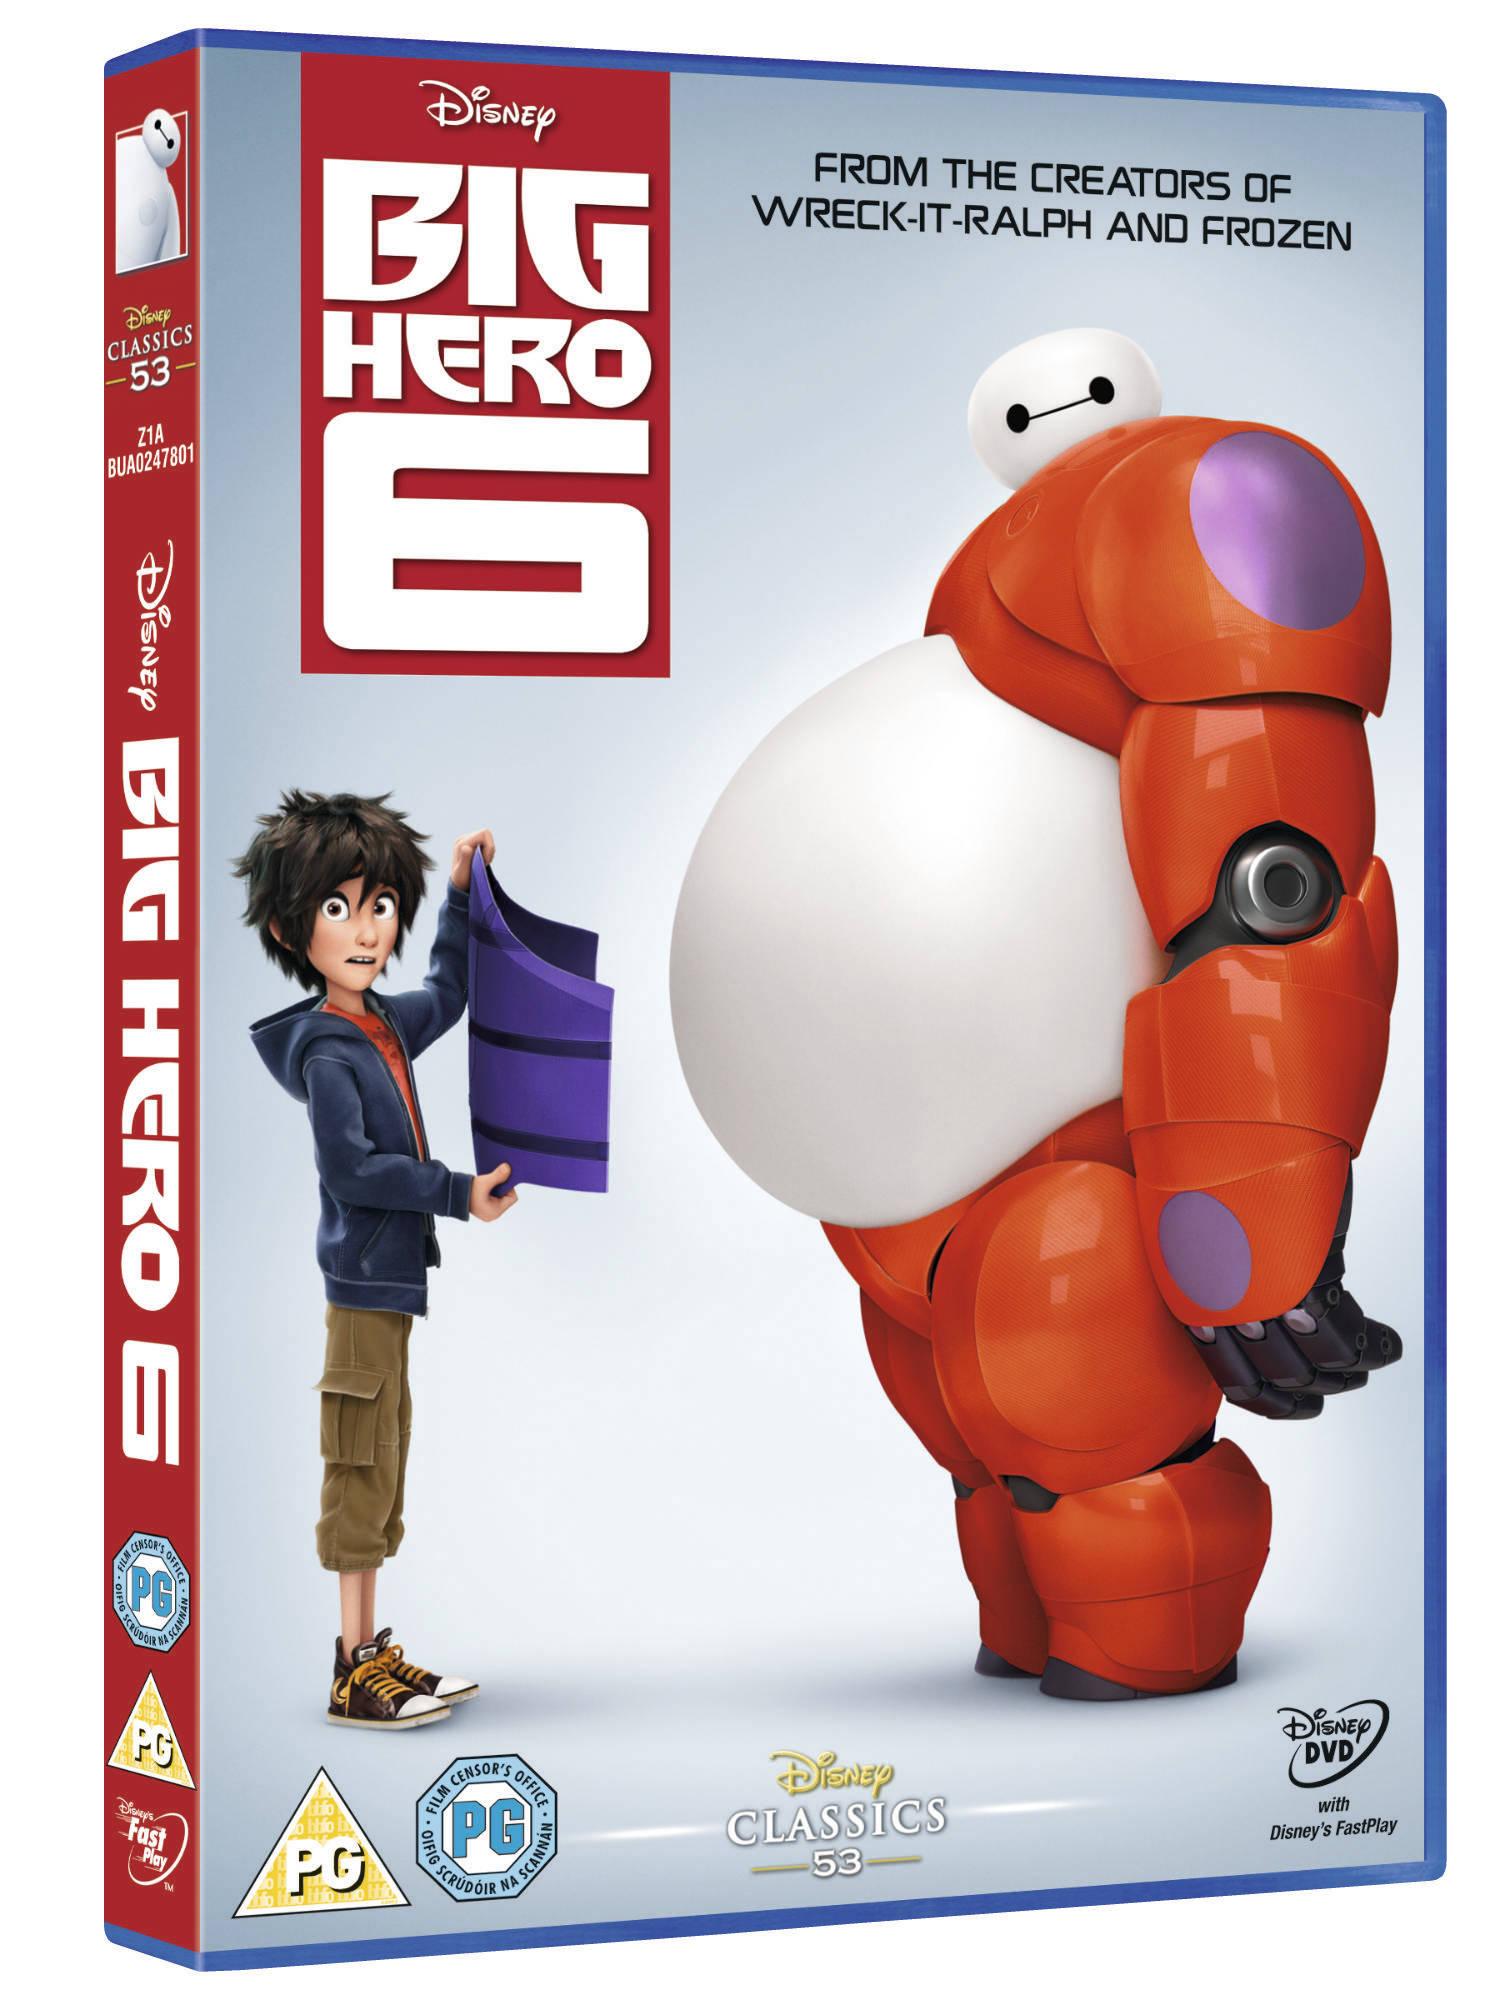 disney's big hero 6 DVD London Mums magazine competition